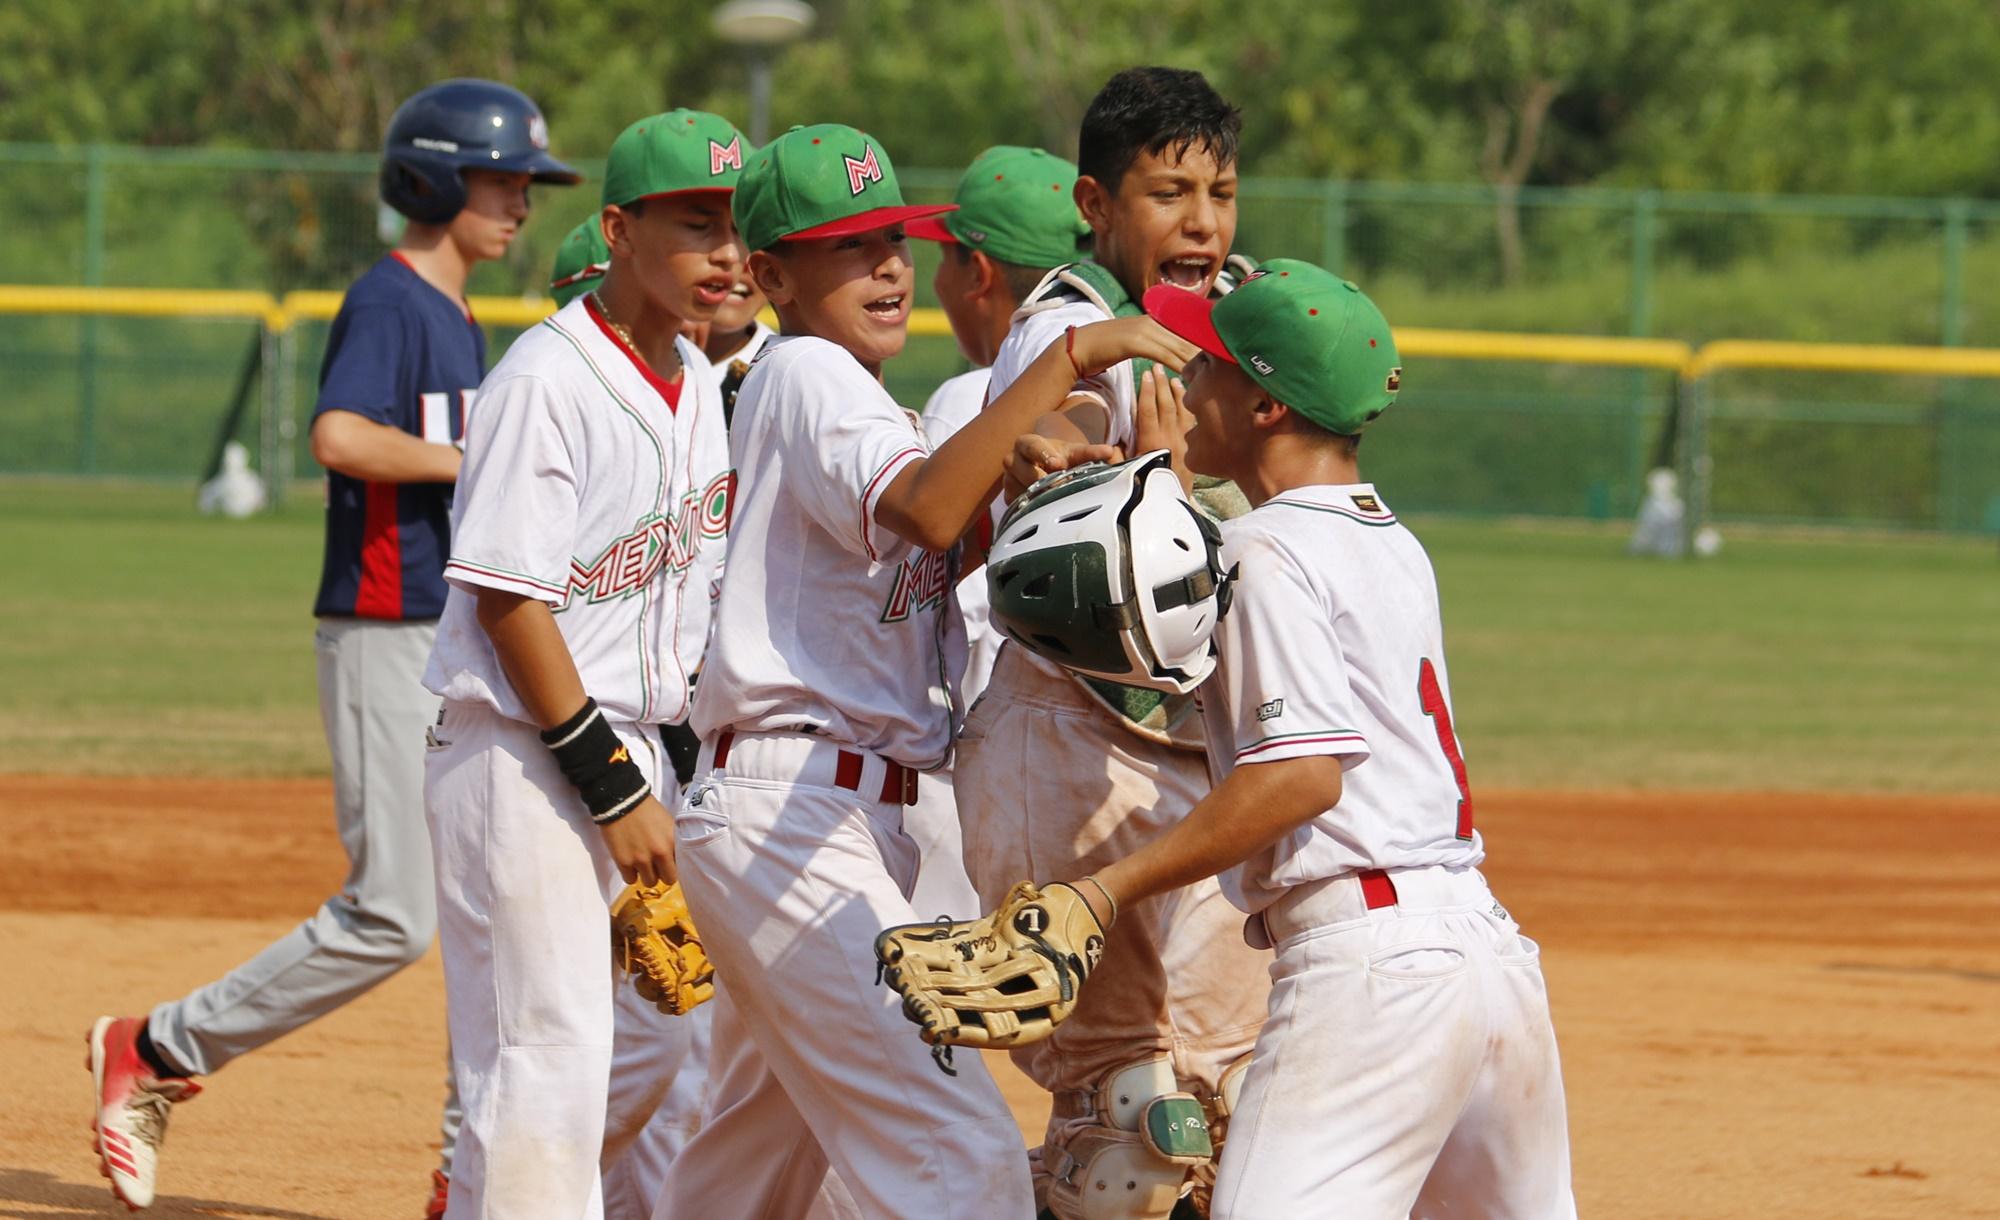 Mexico's players joy